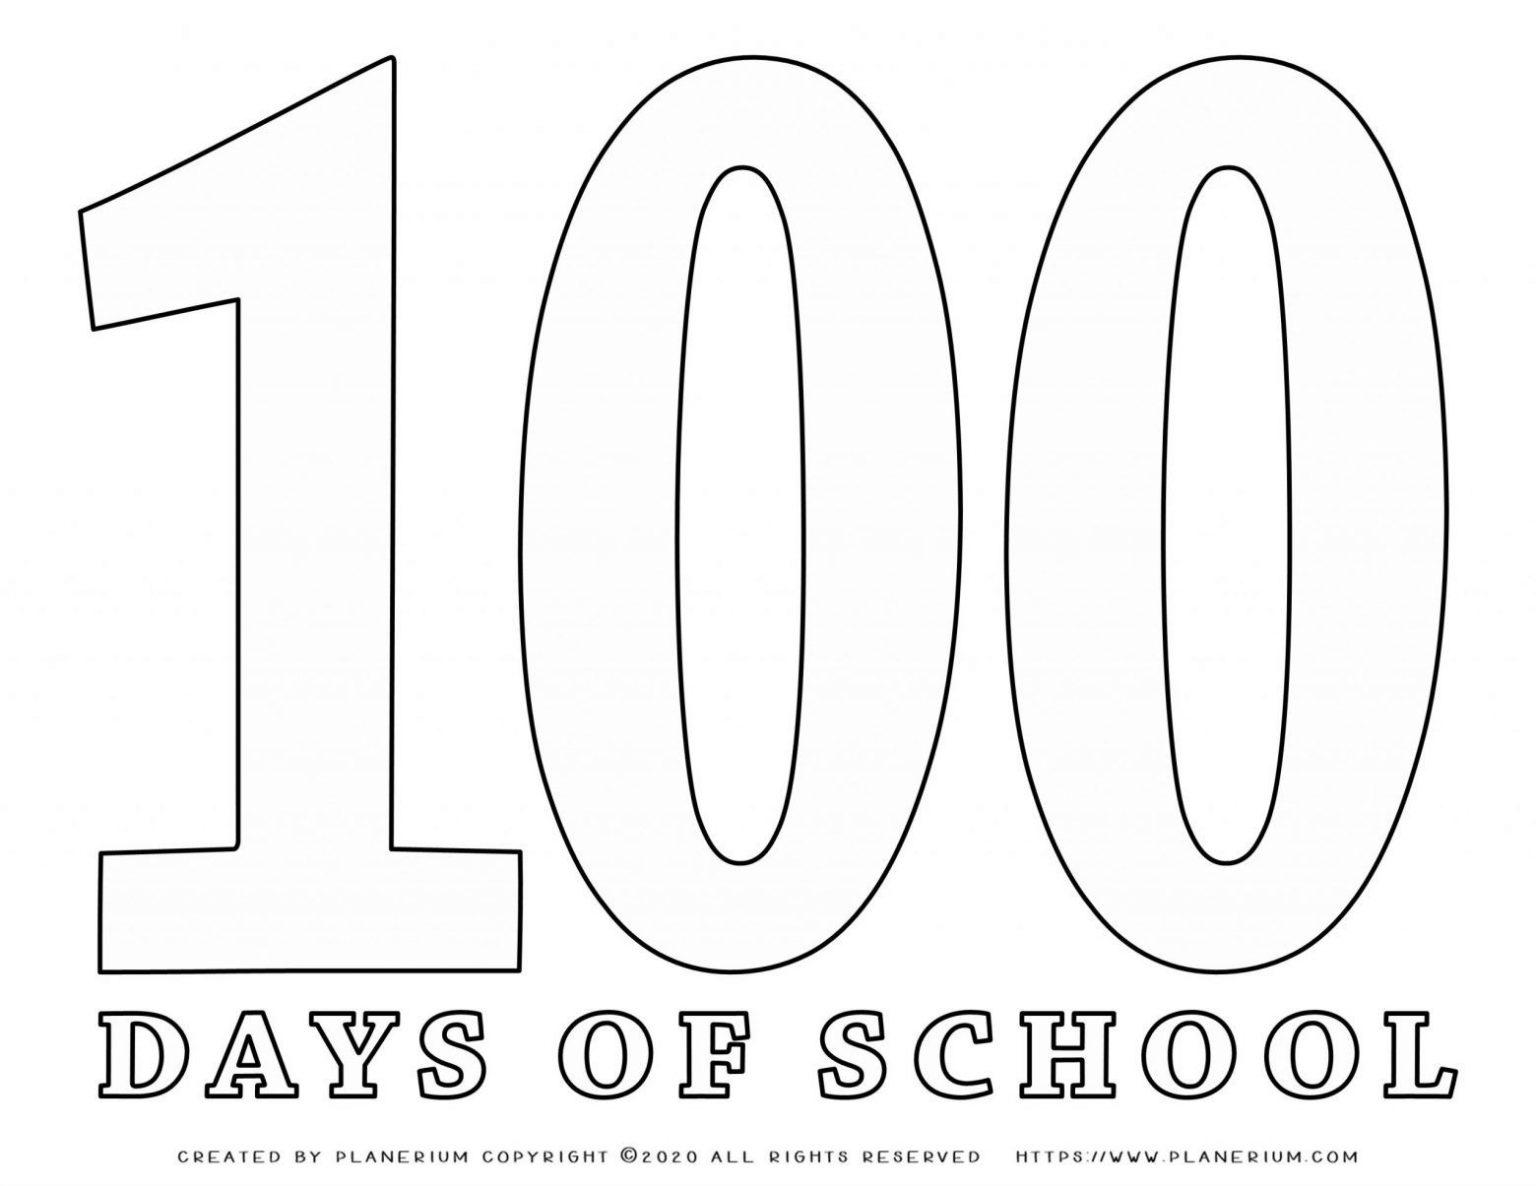 100 Days of School - Coloring Page - Big 100 | Planerium